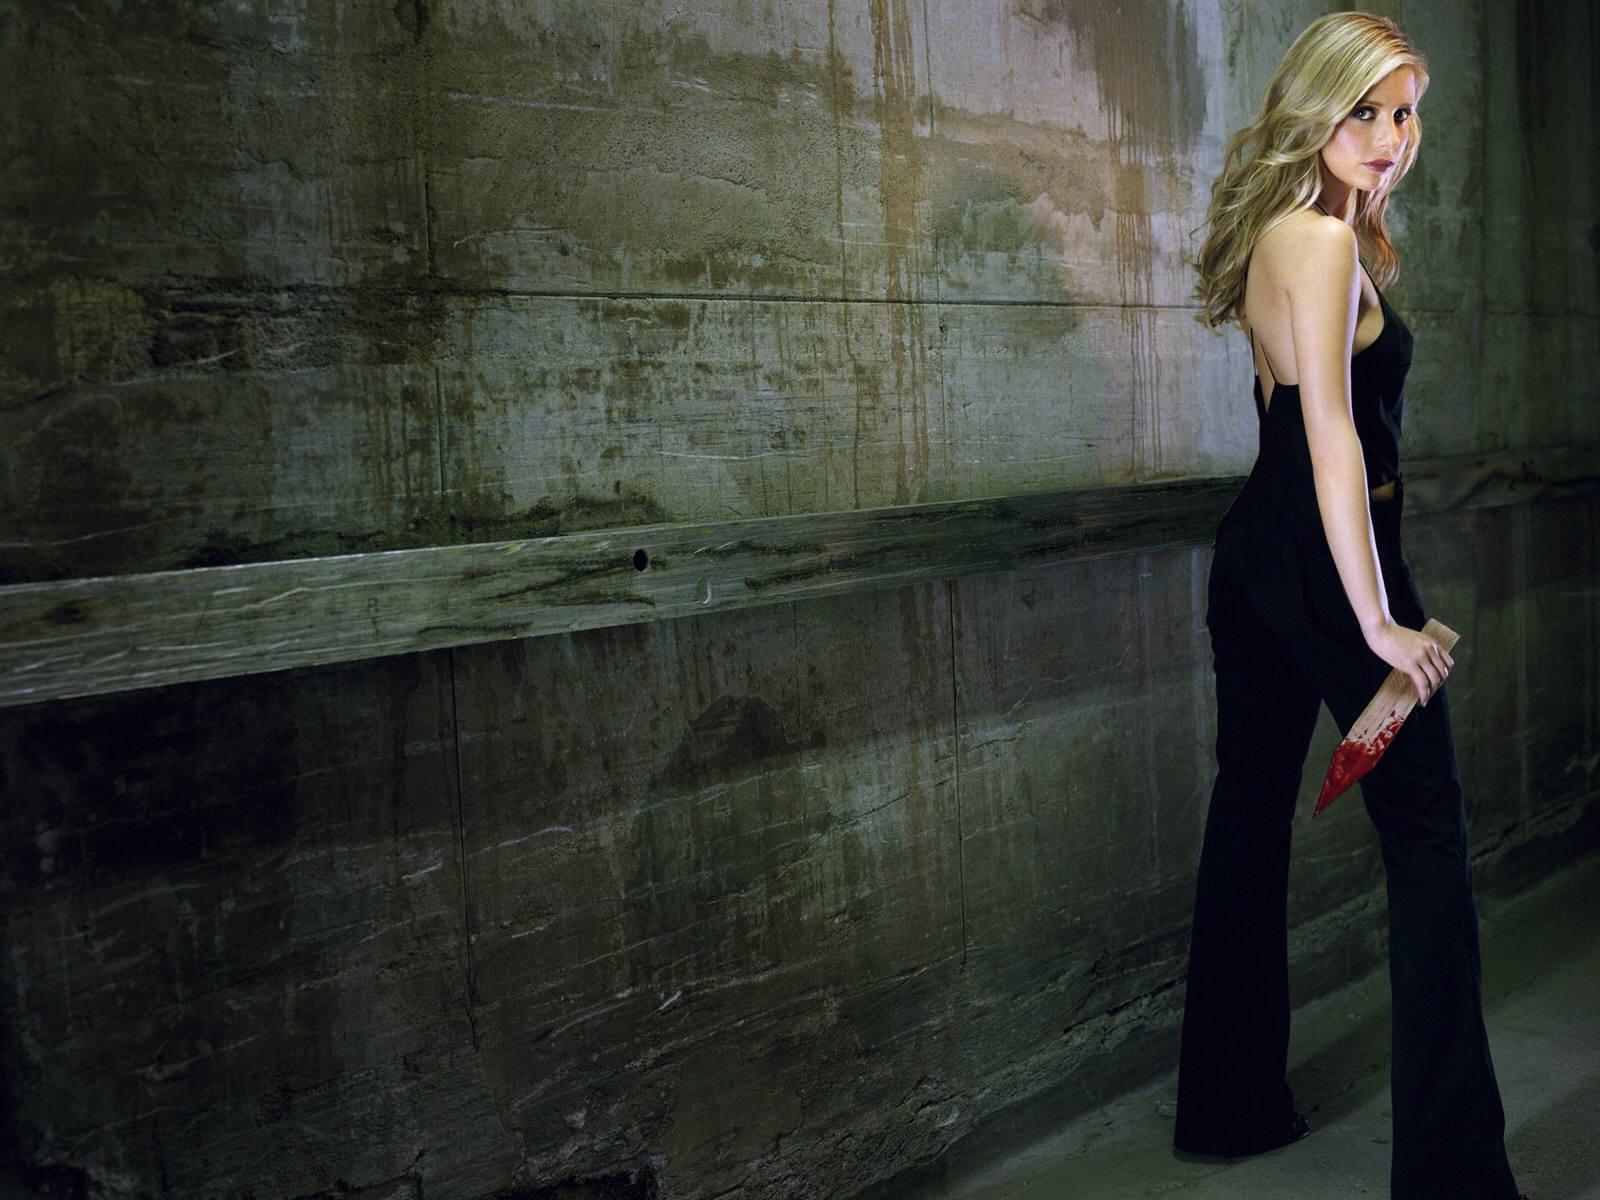 Wallpaper di Sarah Michelle Gellar nei panni di Buffy Summers